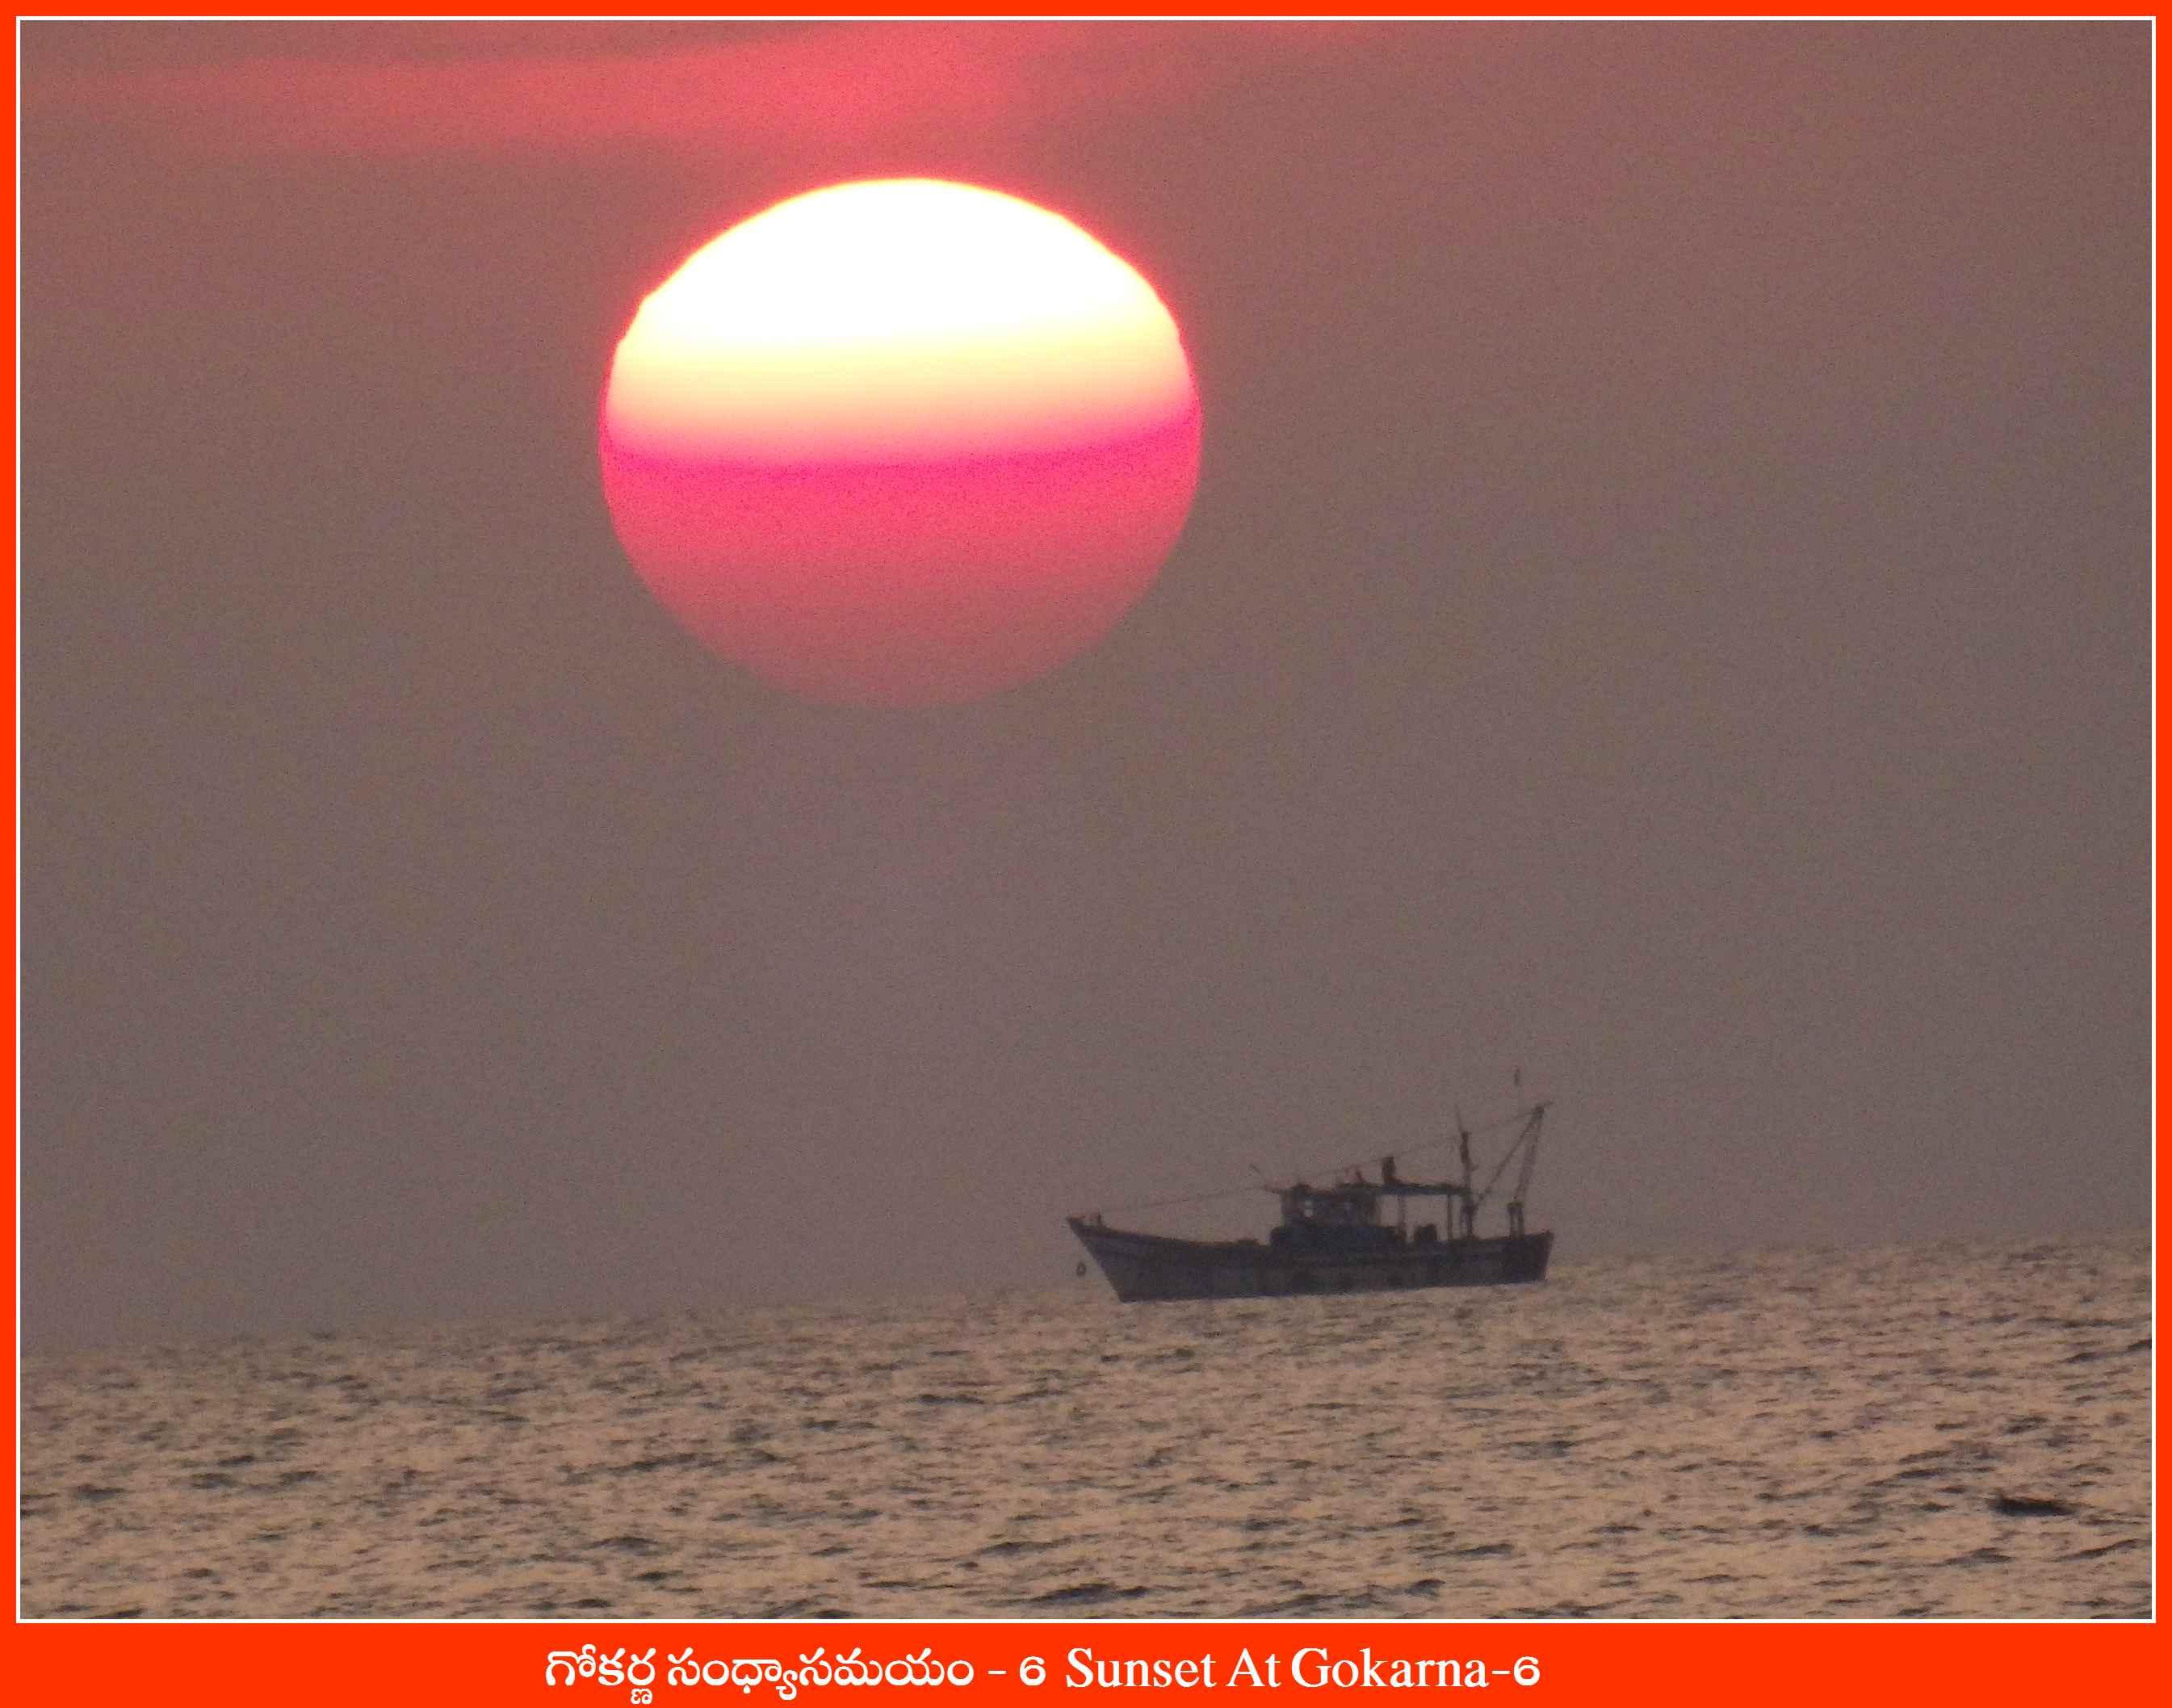 Sunset At Gokarna-6